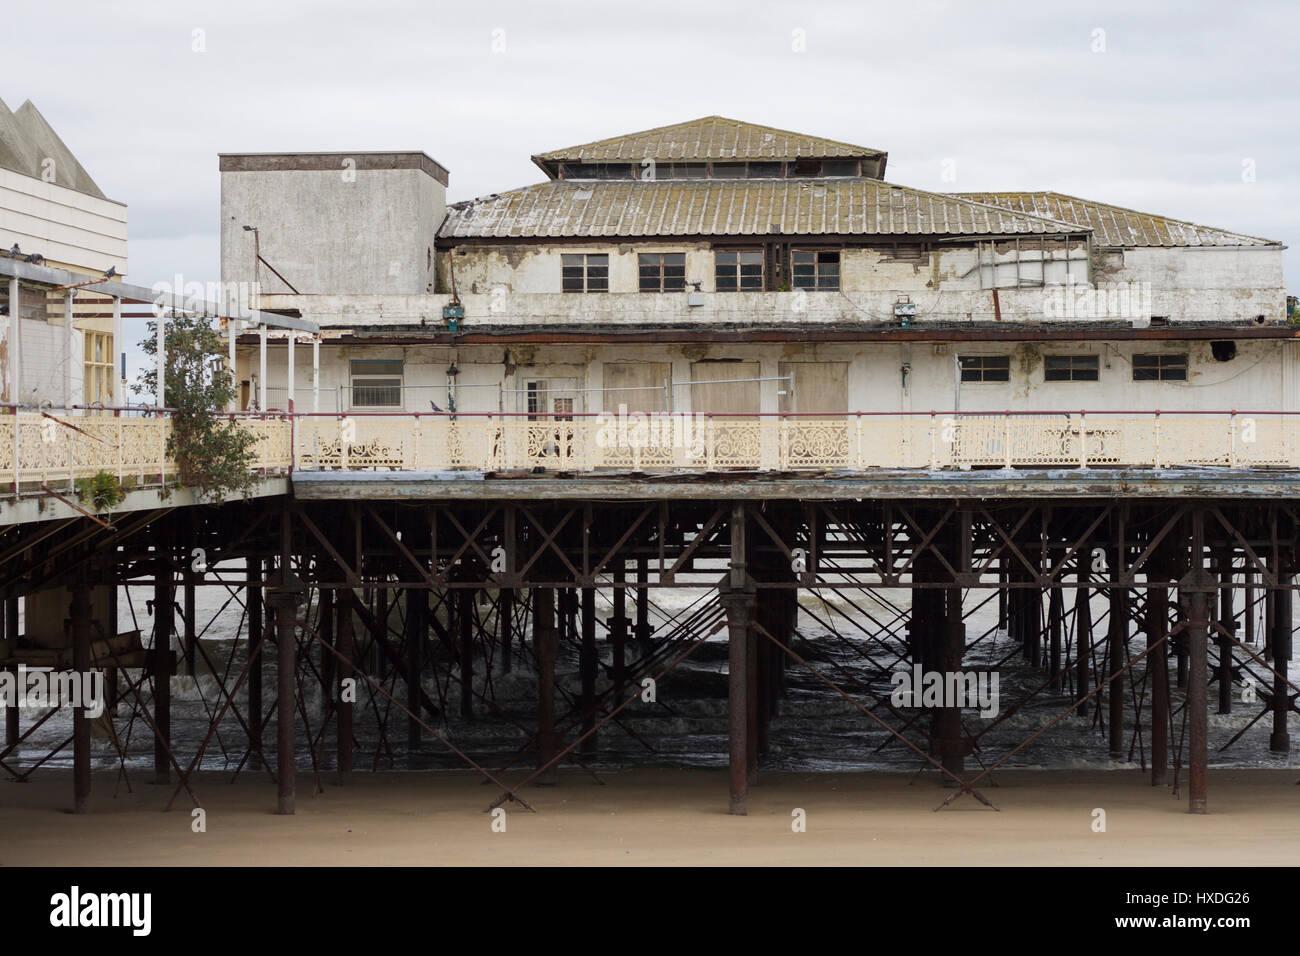 Colwyn Bay Pier - Stock Image